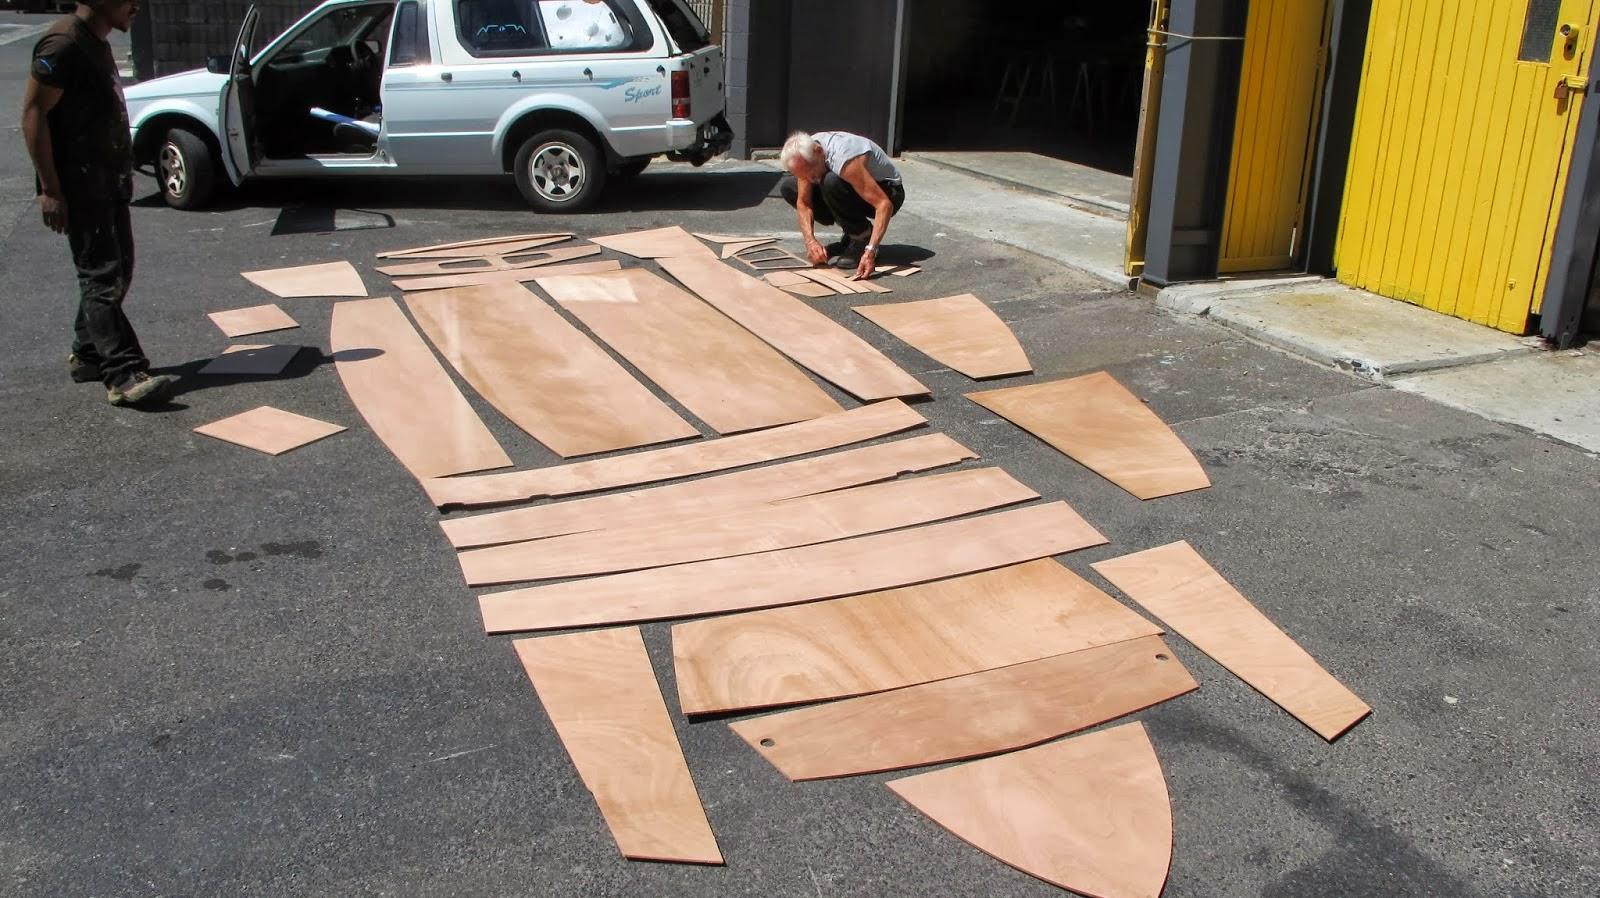 cnc plywood boat kits | Small Plywood Boat Plans Free